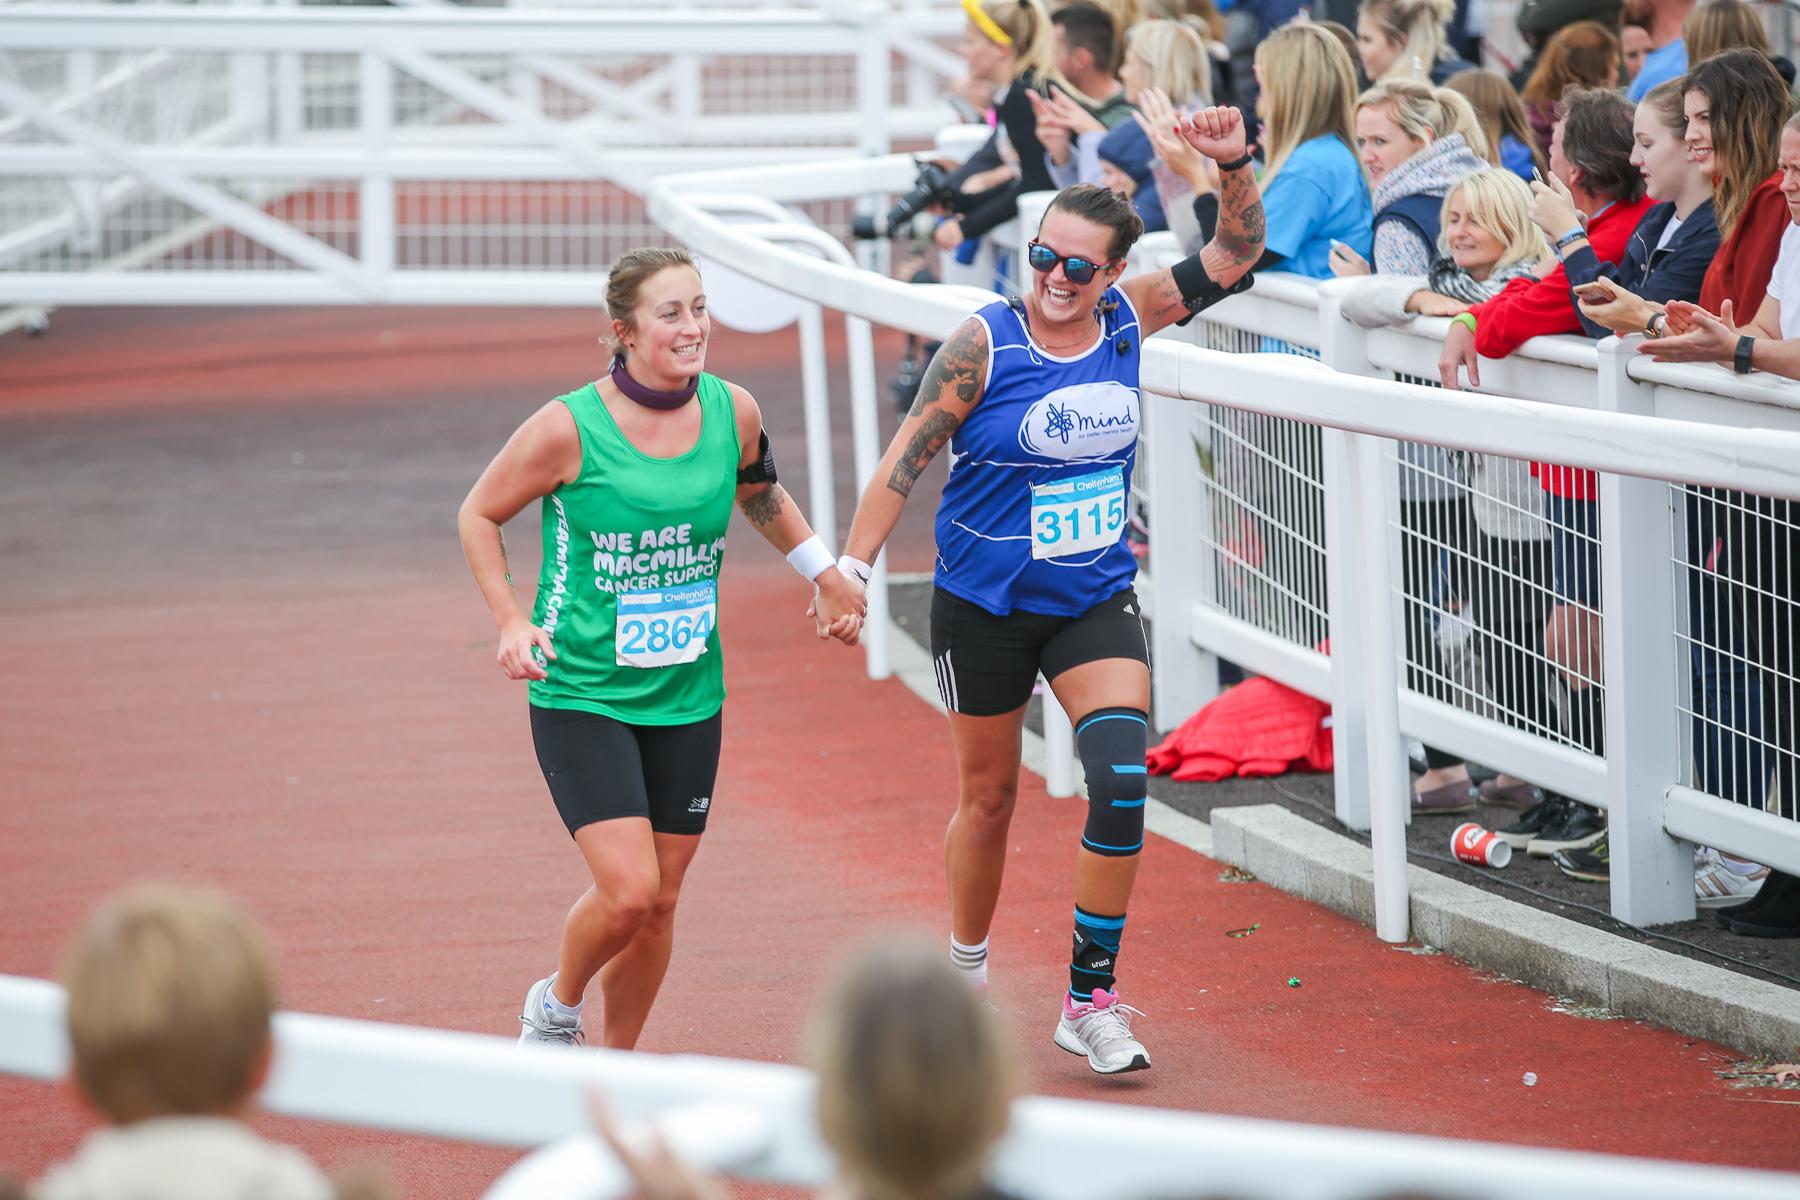 Macmillan-charity-marathon-run-cheltenham-racecourse-september-2018-natalia-smith-photography0335.jpg